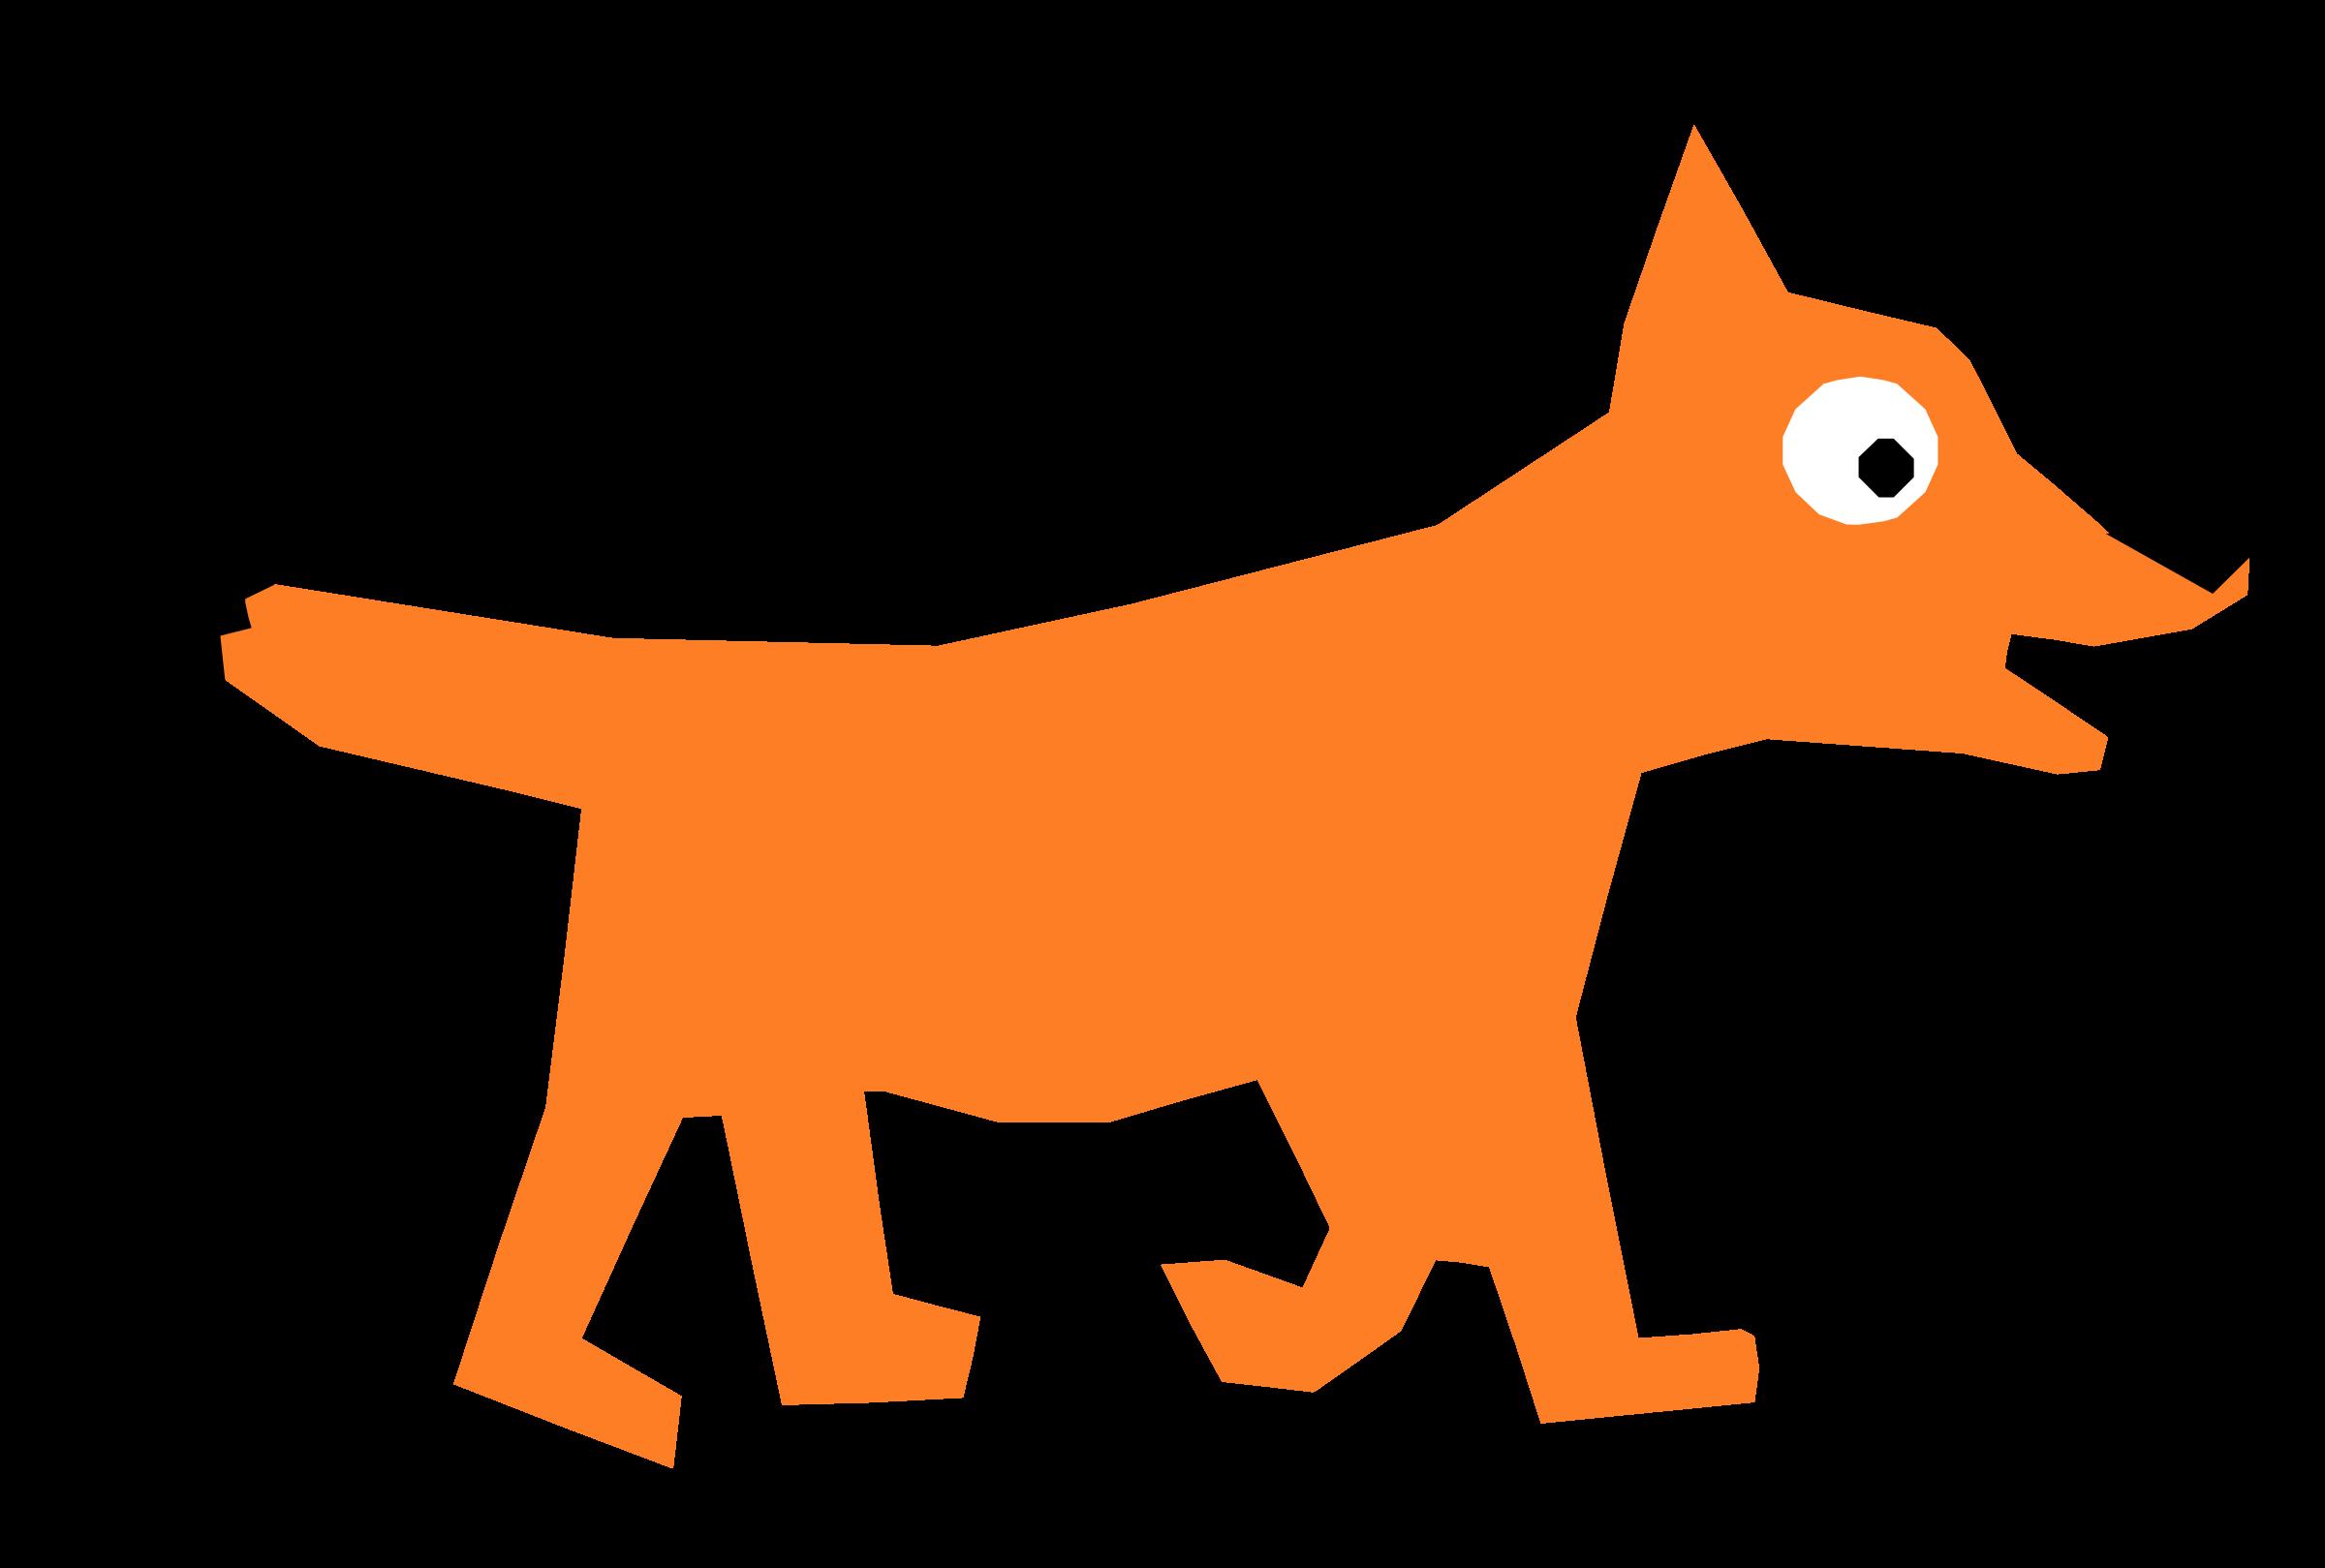 Orange Cartoon Fox vector clipart.